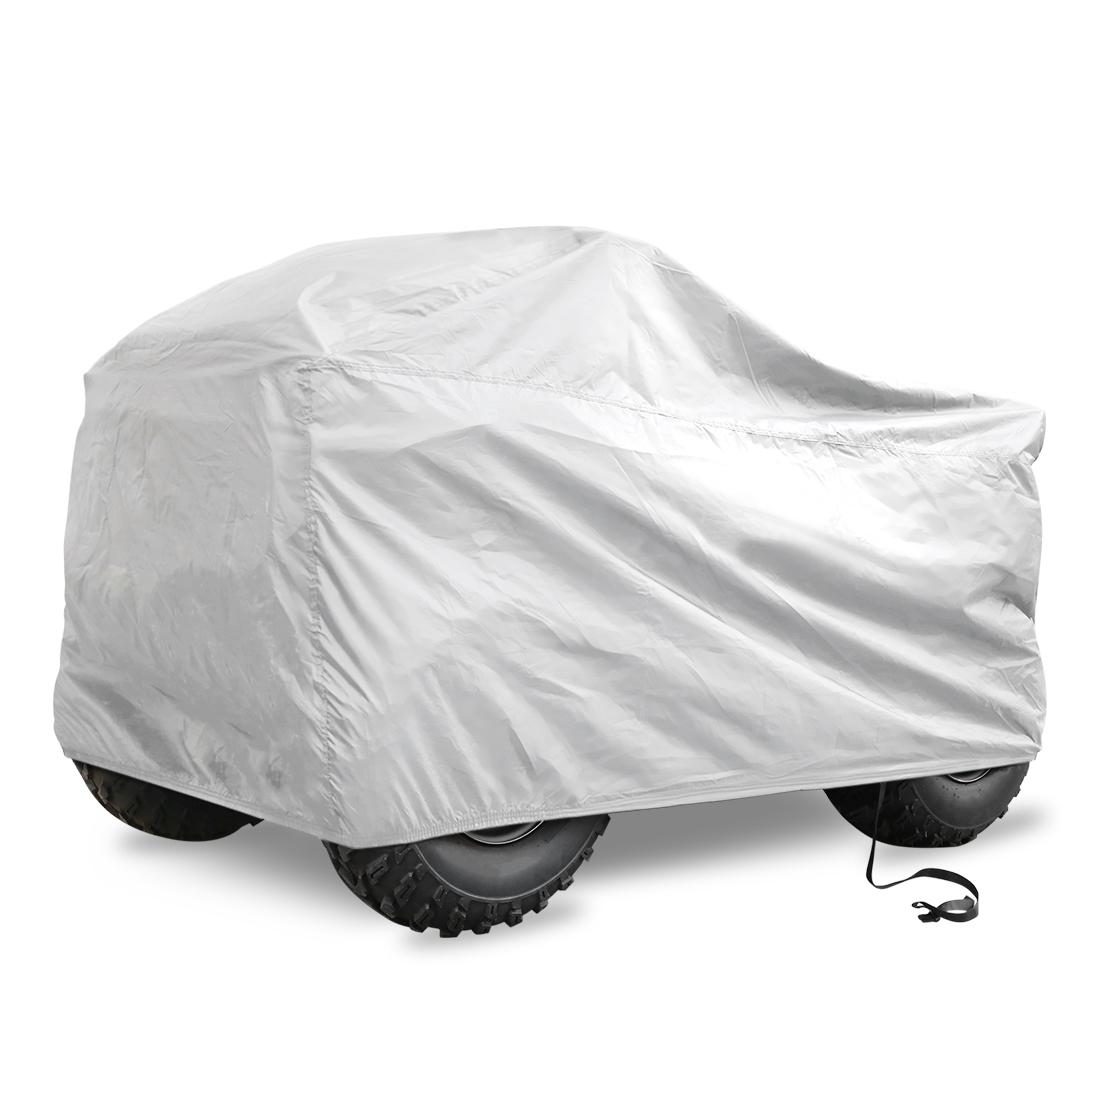 Silver Tone Rain Water Resistant Protective Quad Bike ATV Cover 210x120x115cm